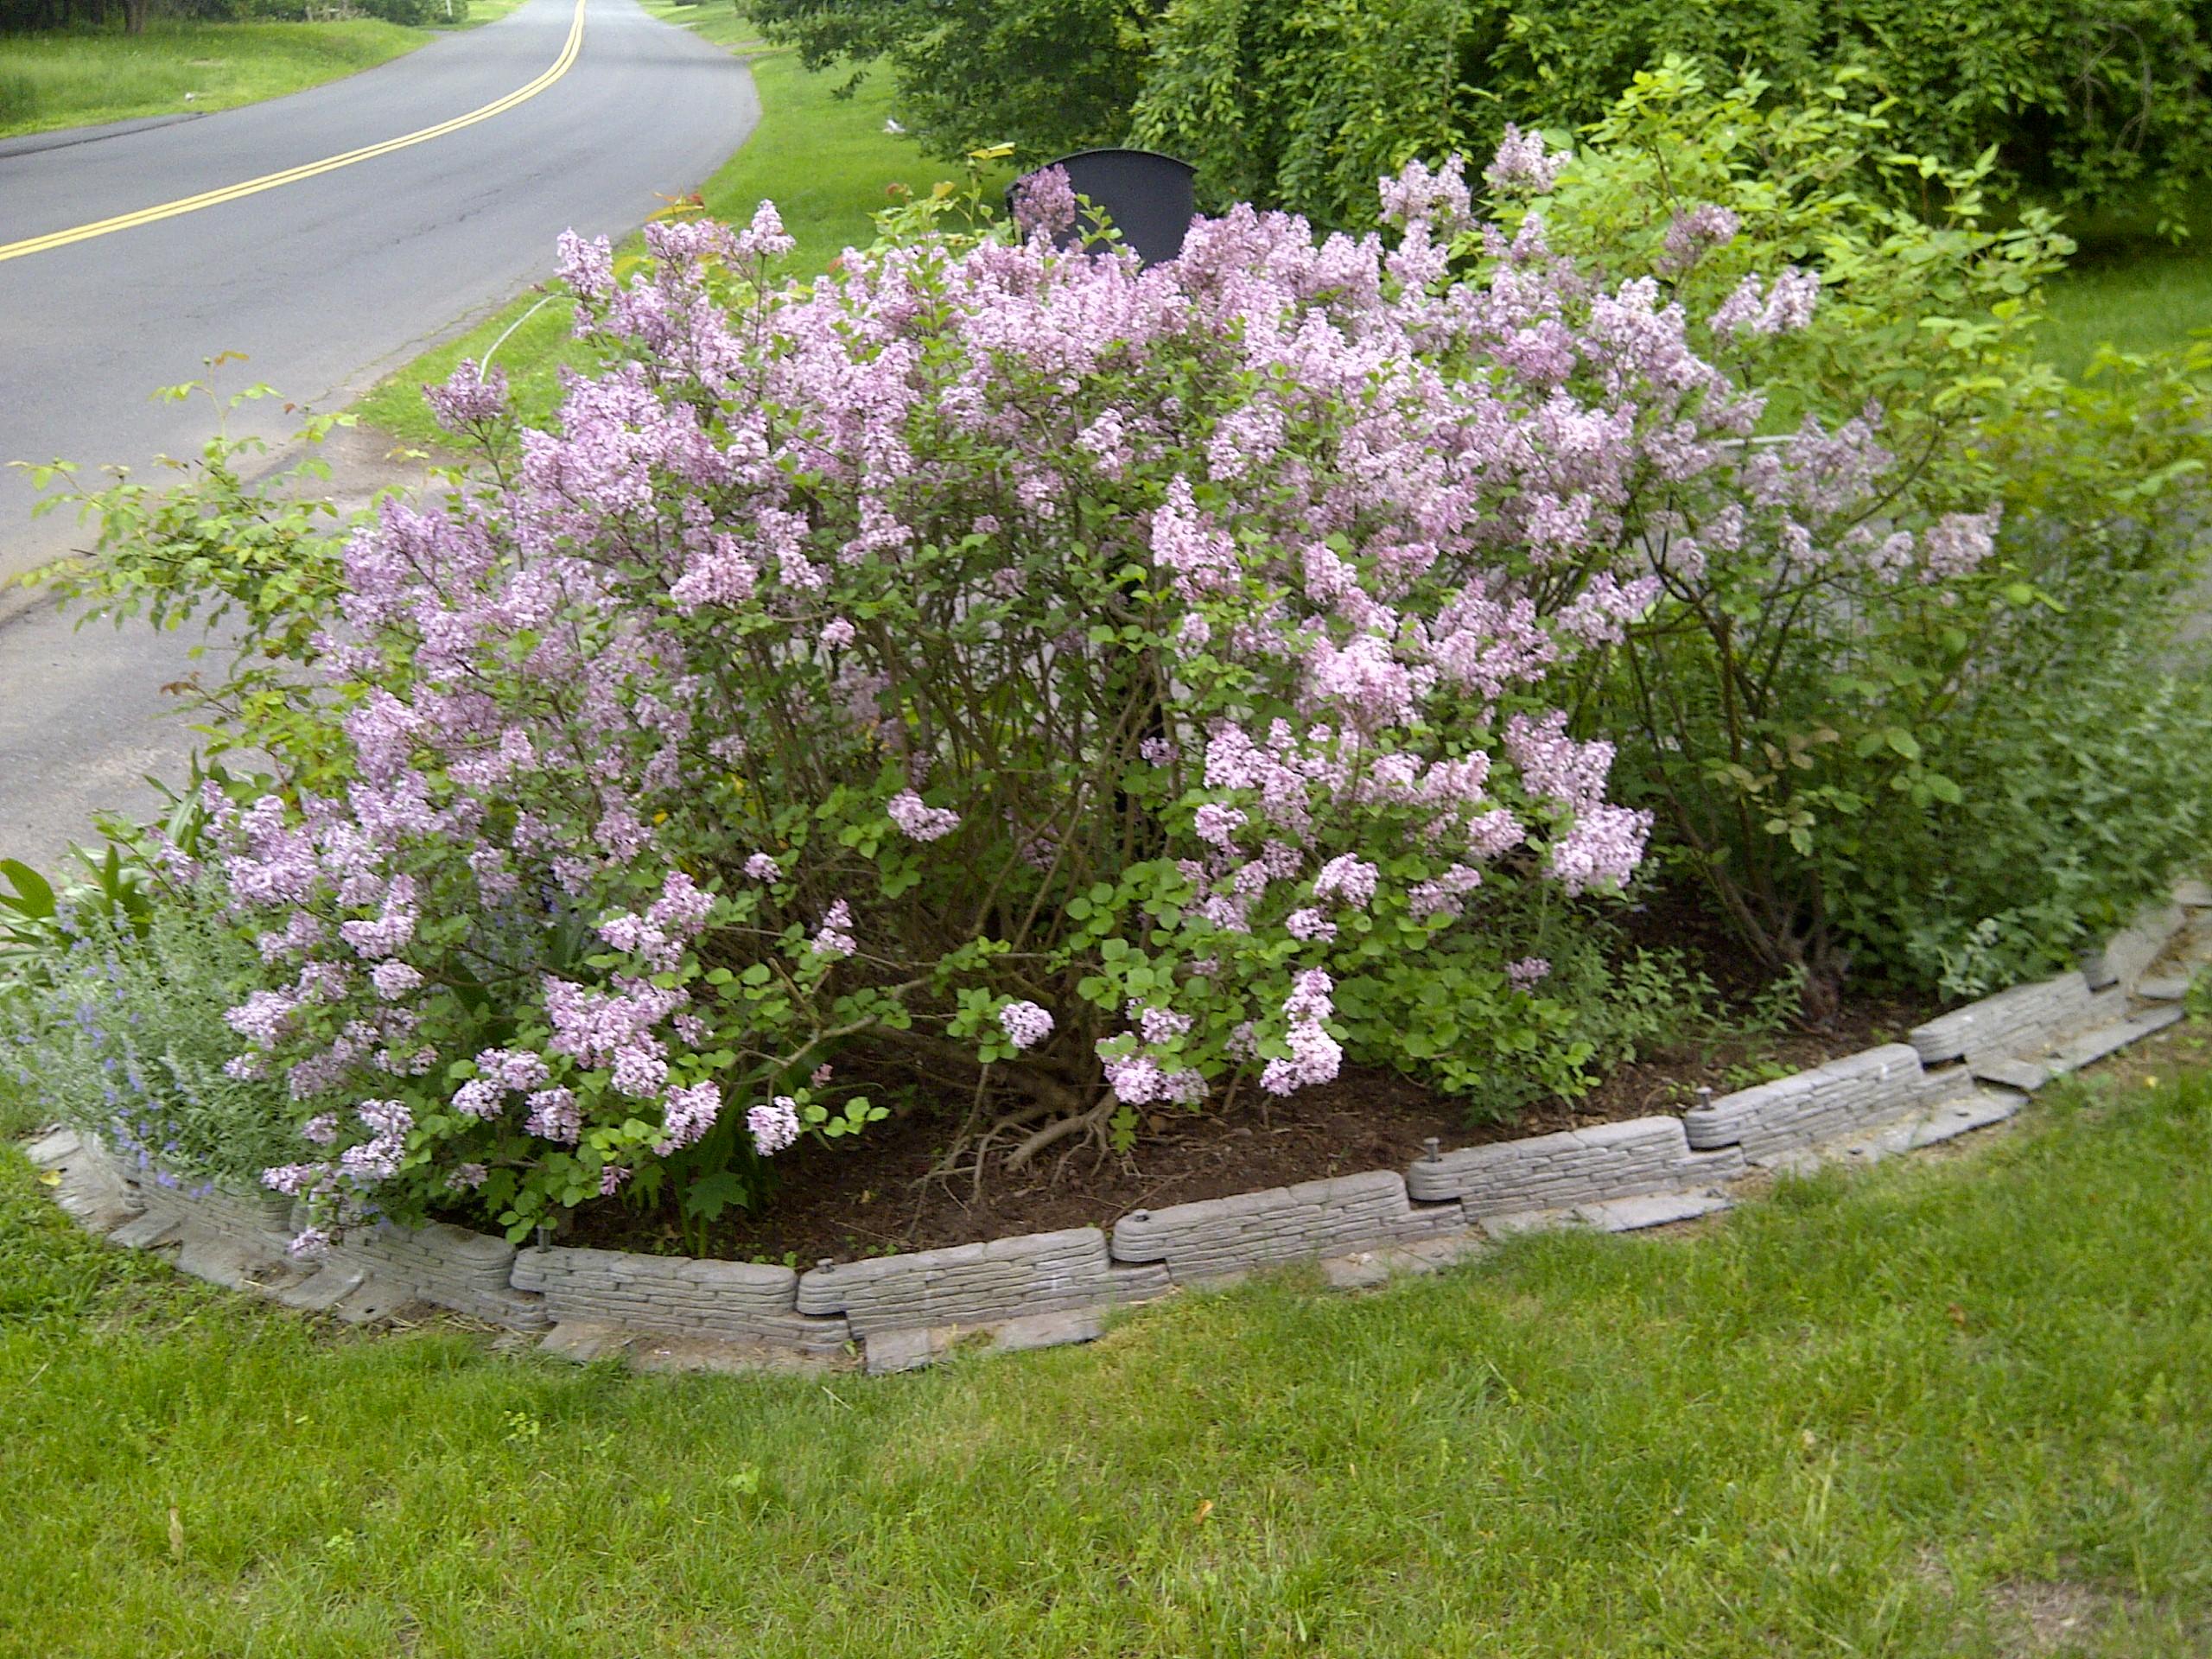 Wordless wednesday later spring blooming shrubs gardendaze - Blooming shrubs ...